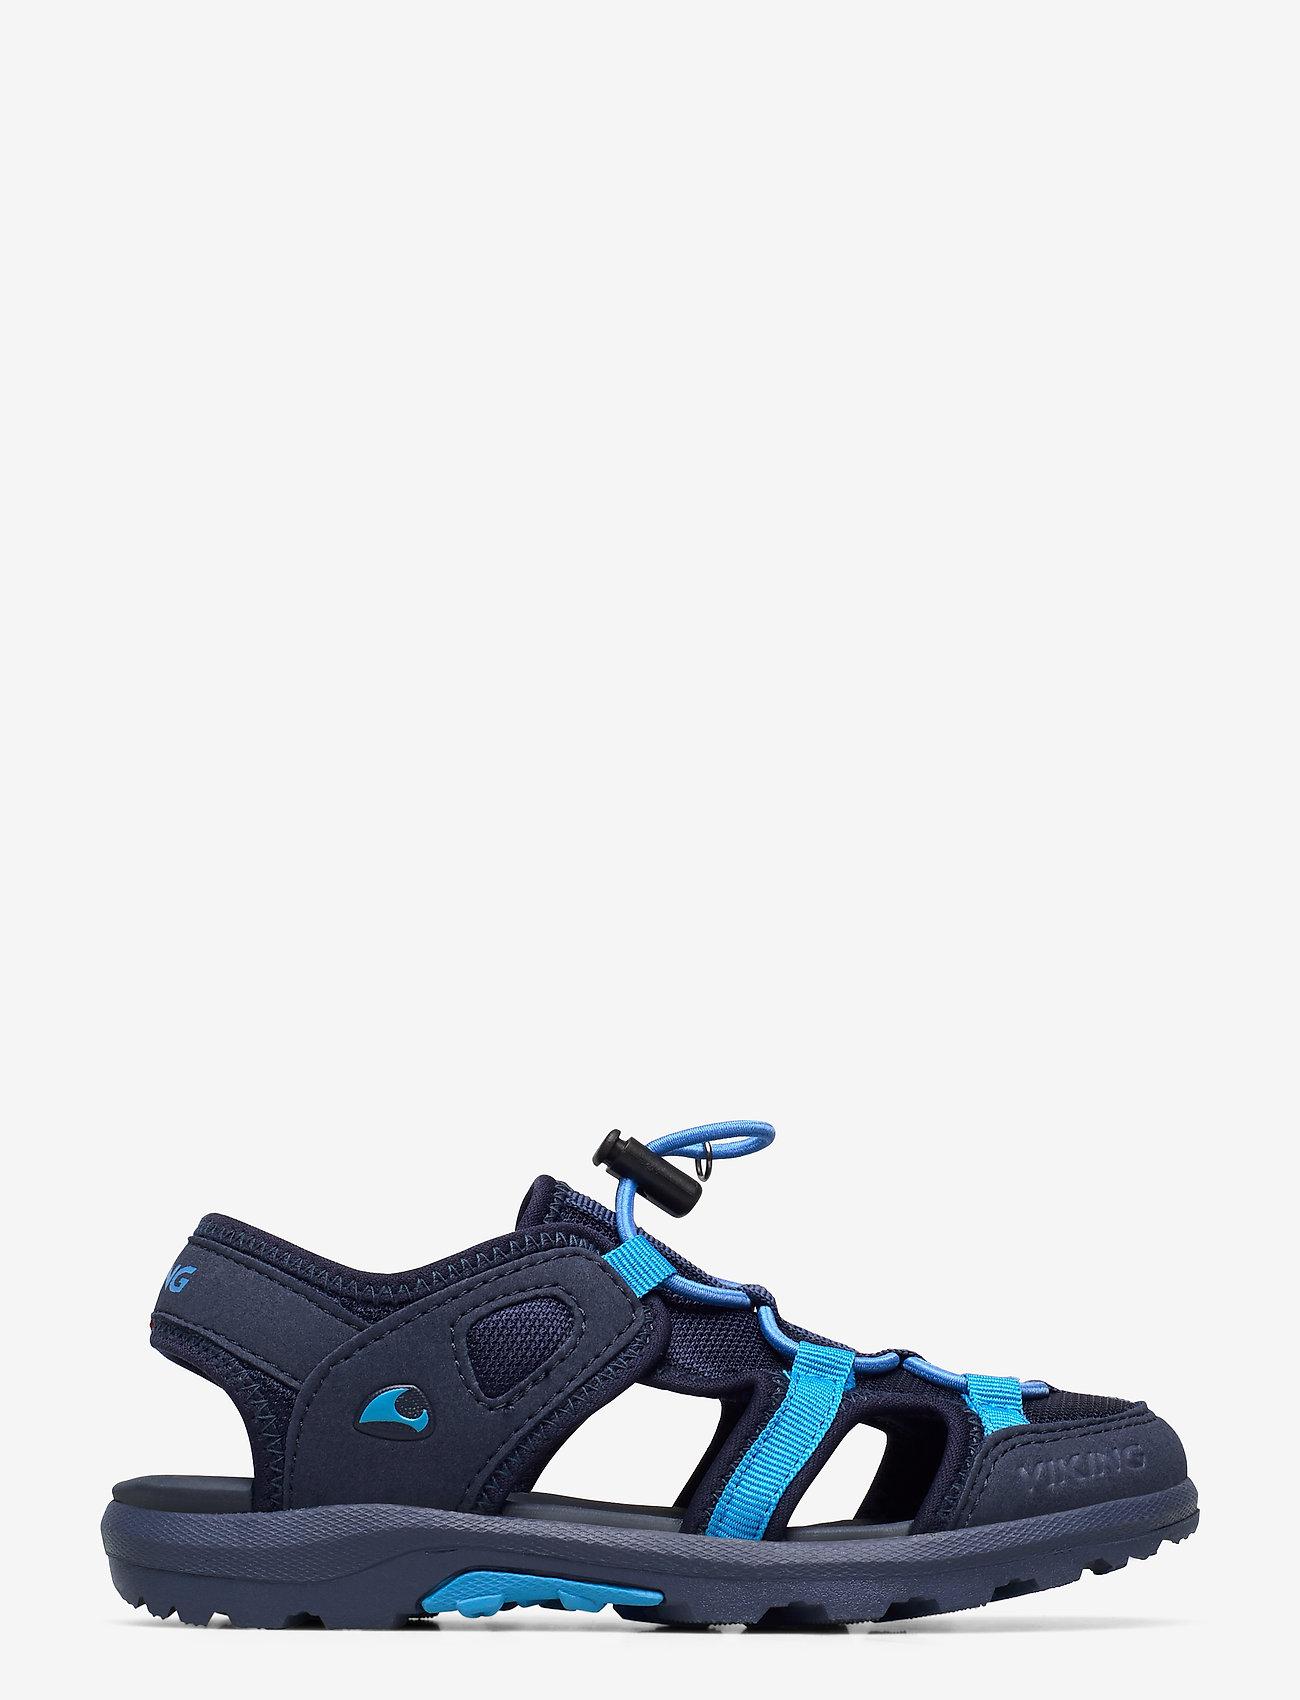 Viking - Sandvika - sandals - navy/blue - 1